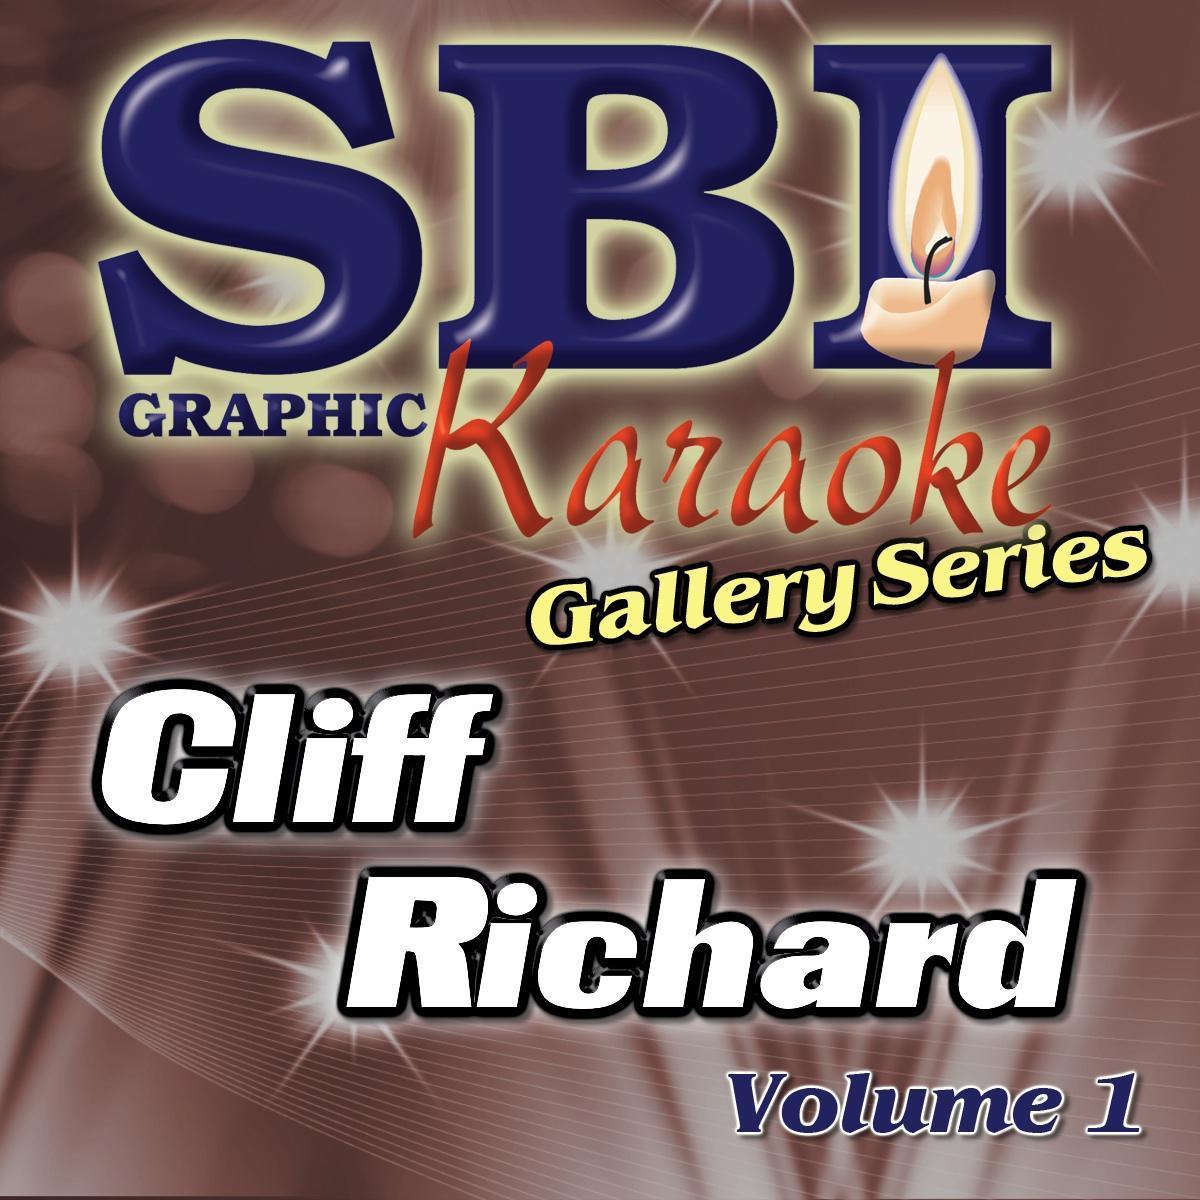 Abel Tatu Porn sbi gallery series cliff richard vol 1 (album)